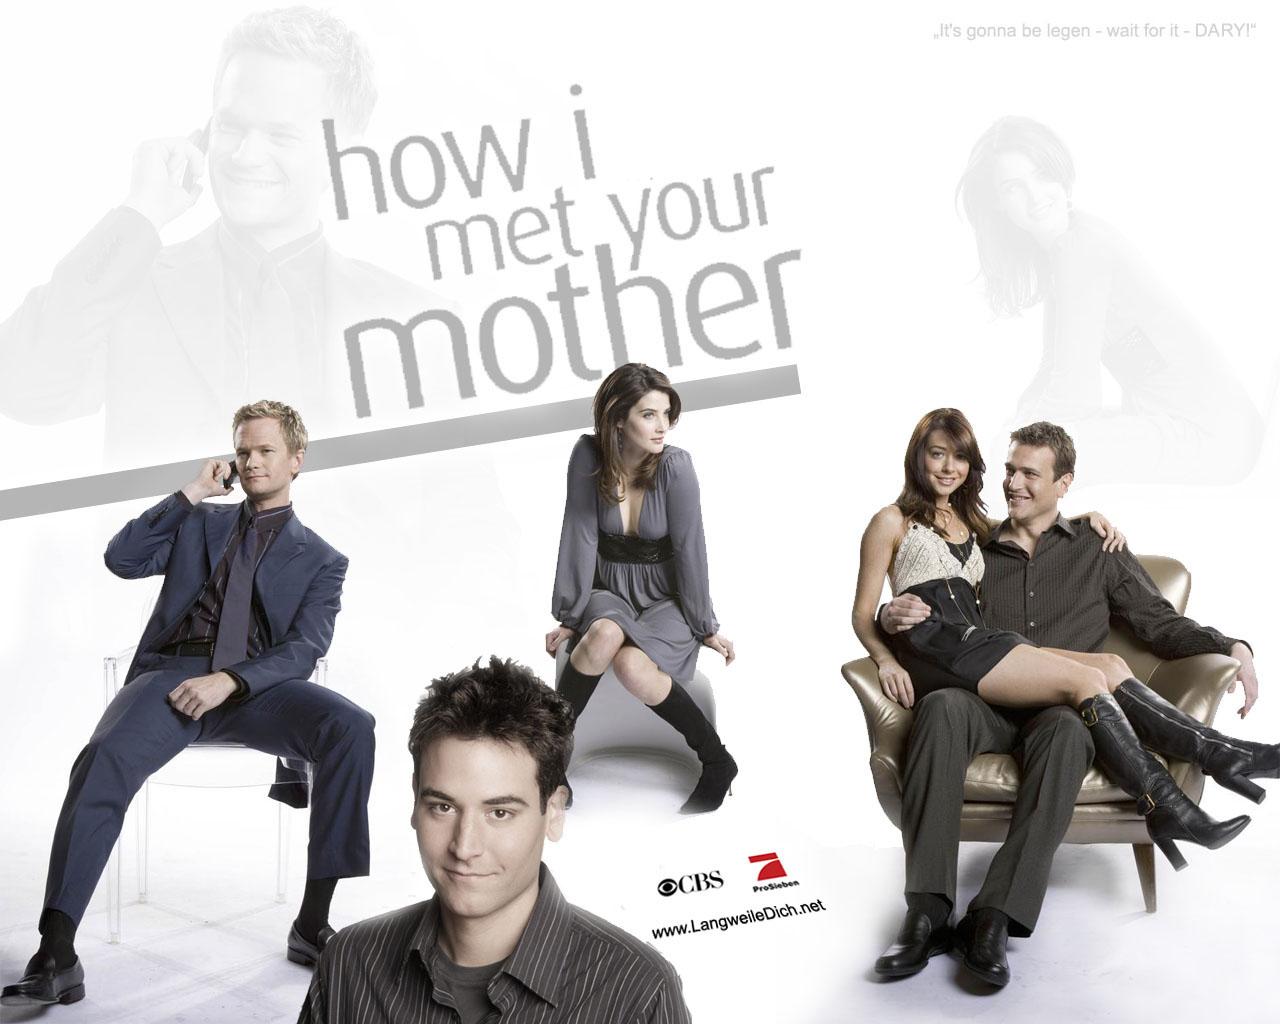 How-I-Met-Your-Mother-how-i-met-your-mother-23910961-1280-1024.jpg